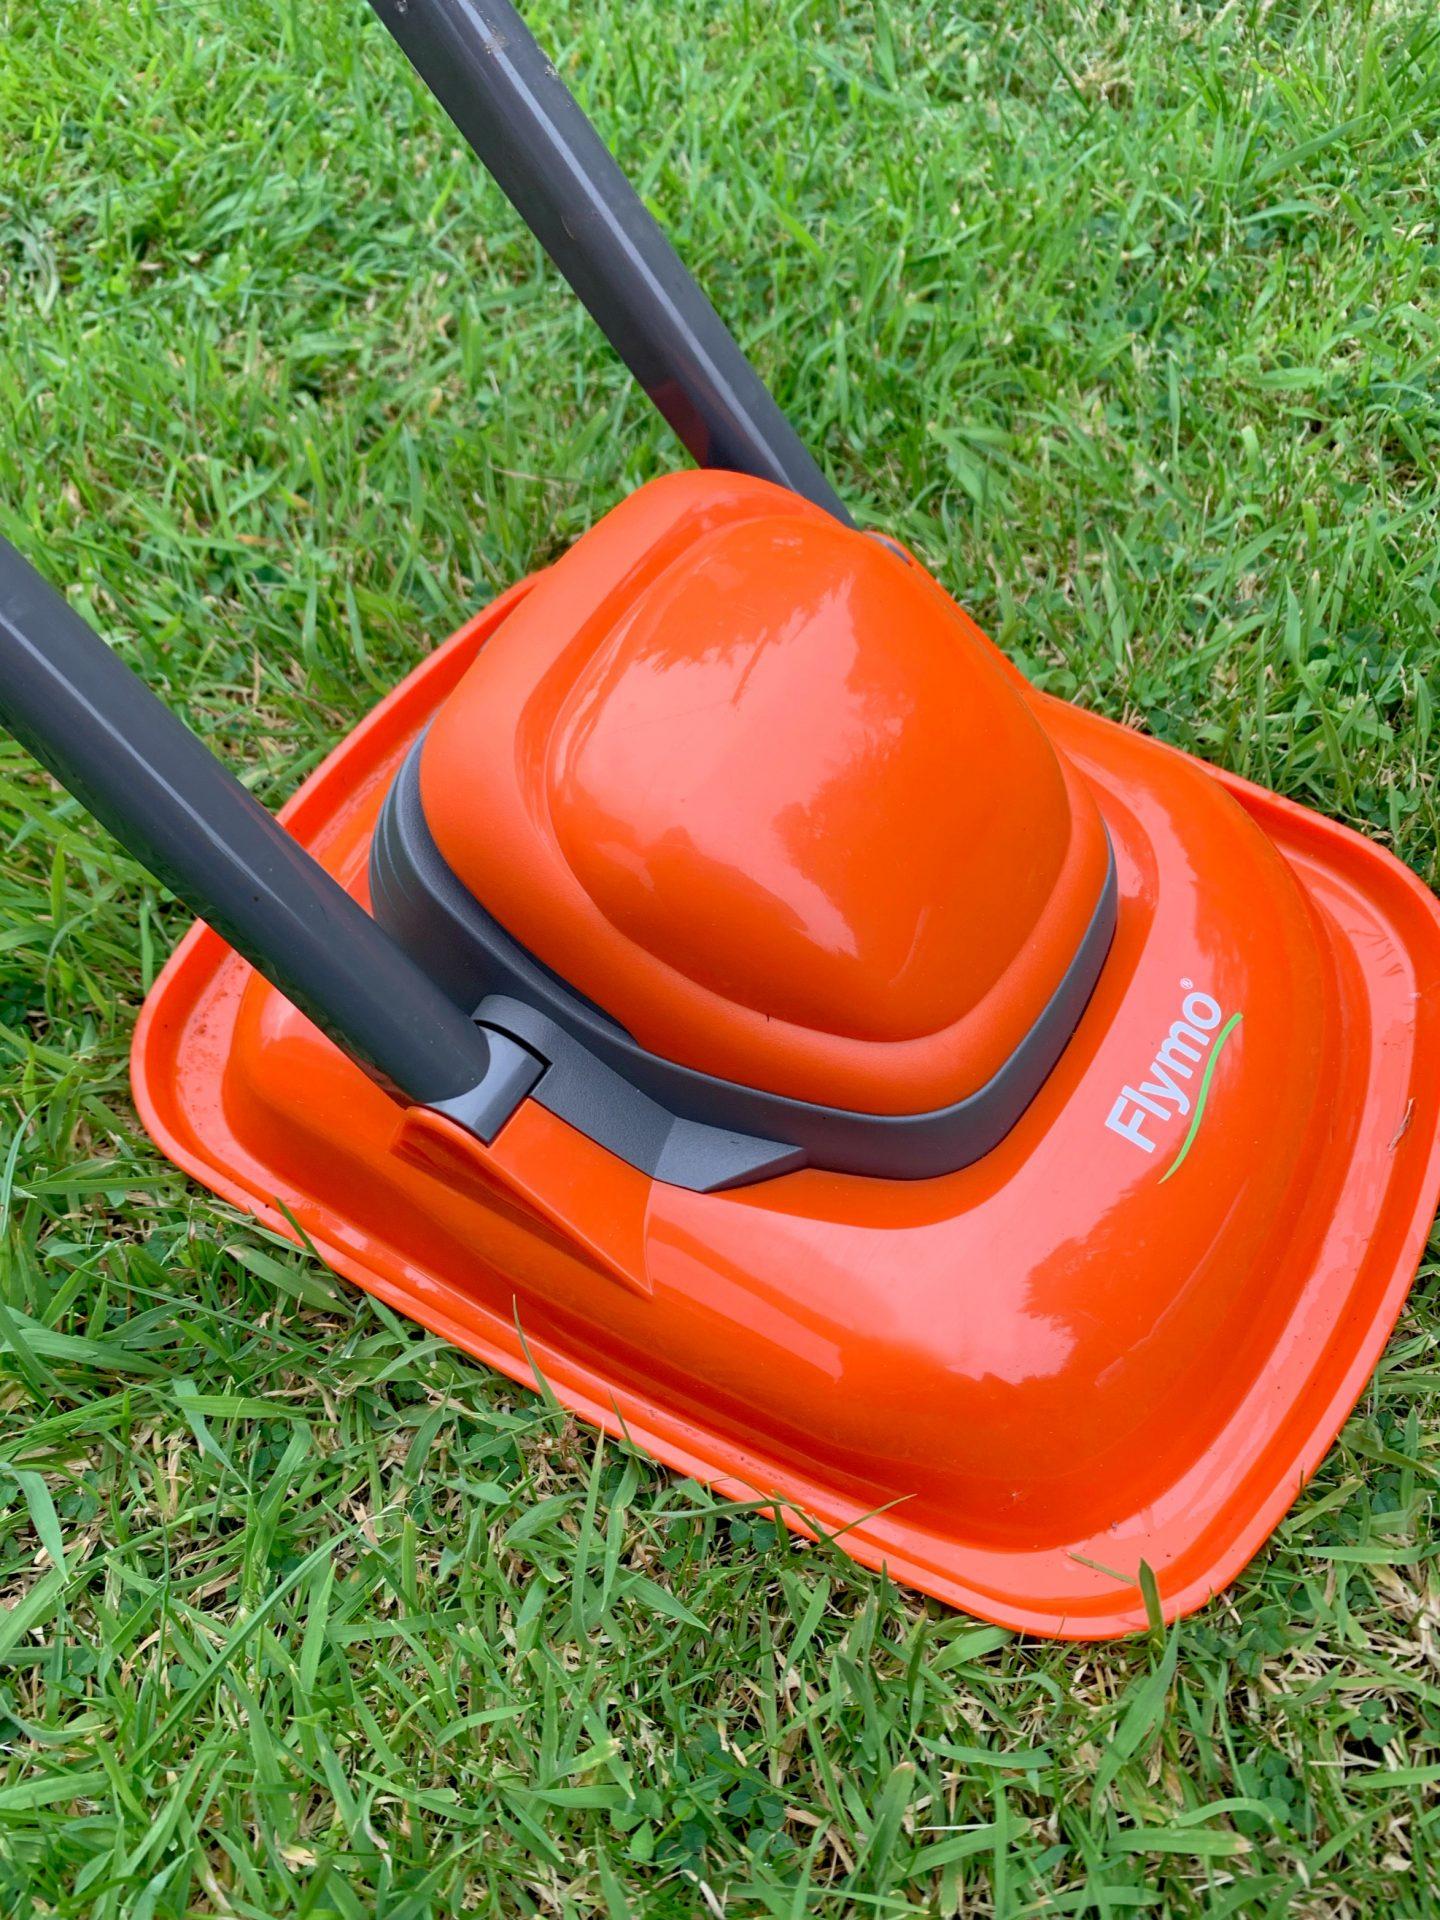 Casdon Flymo Kids Toy Replica Lawn Mower